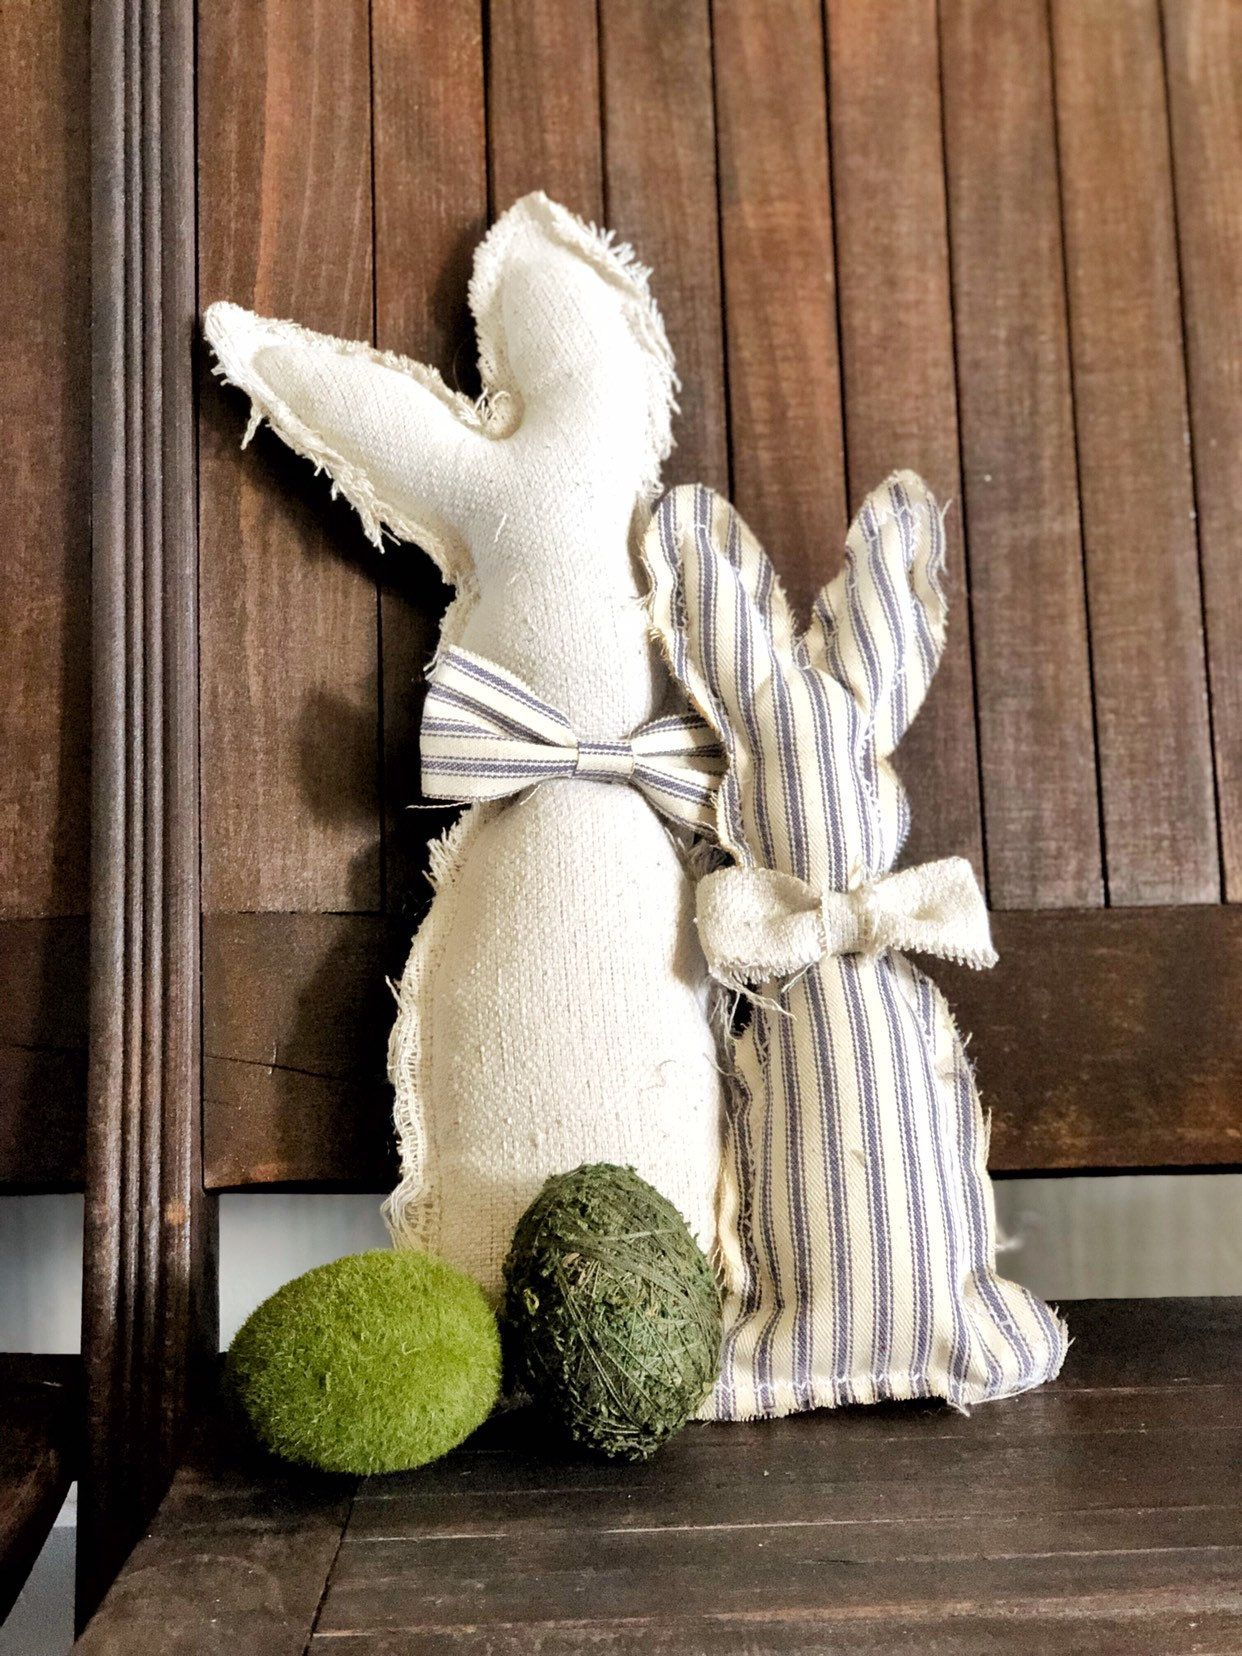 Farmhouse Fabric Bunnies | Farmhouse Easter | Spring Decor | Rustic Fabric Bunnies | Primitive Fabric Bunnies | Free Shipping | Blue Ticking